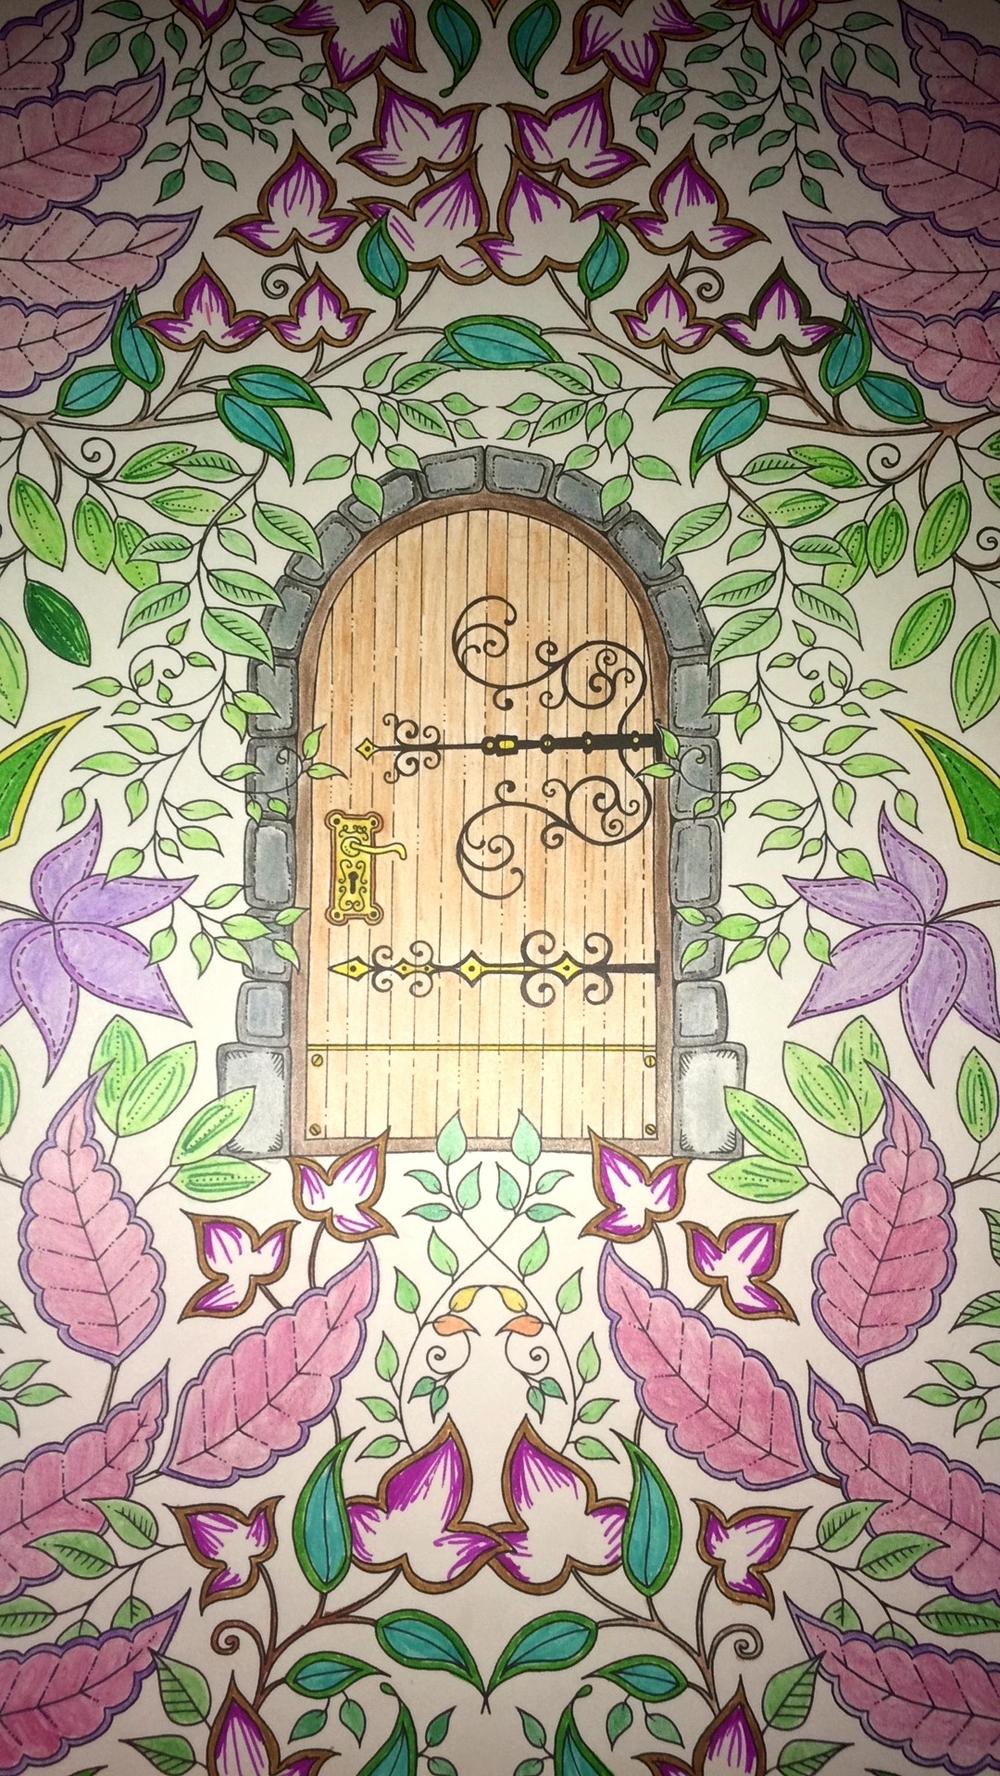 Secret Garden Colouring Book — Gemma Oh